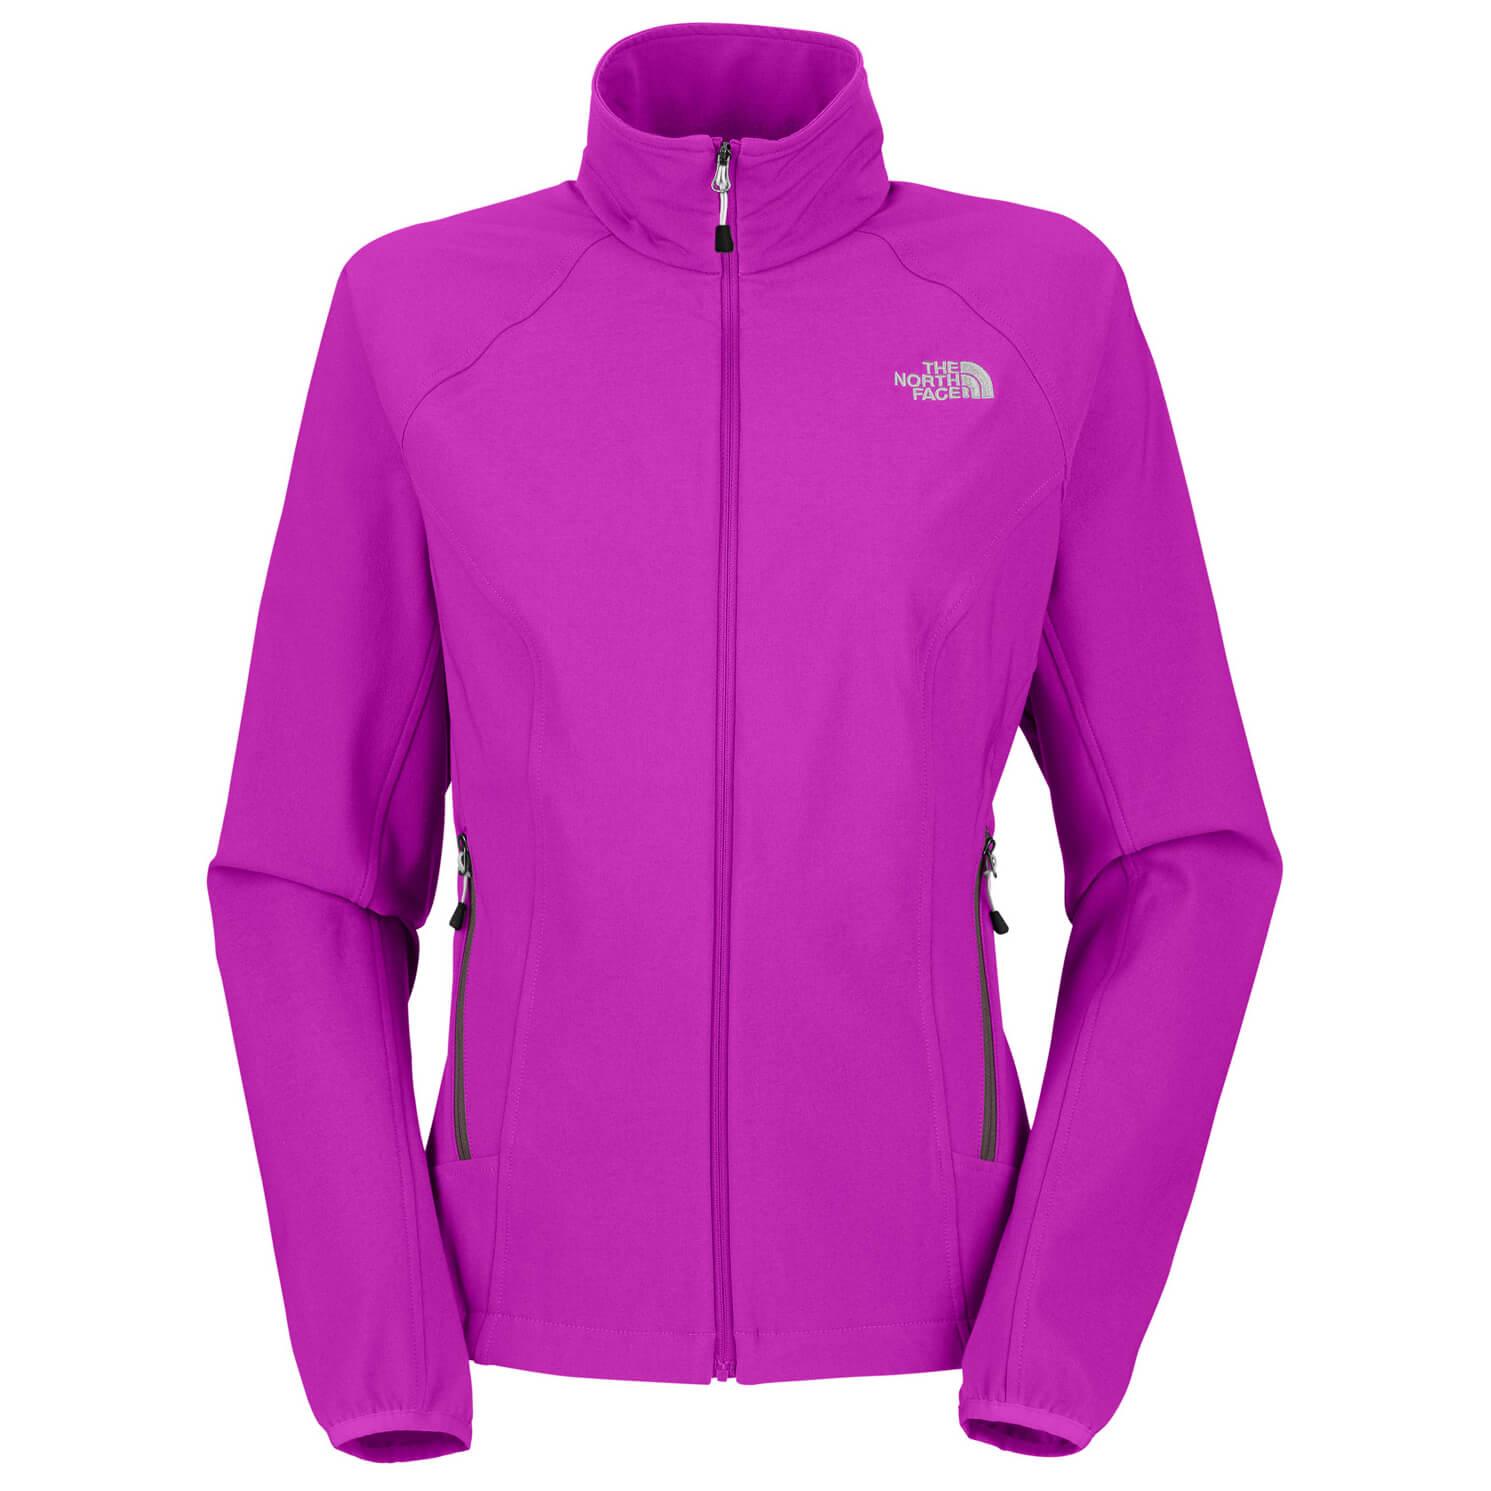 The North Face Women's Nimble Jacket Softshelljacke